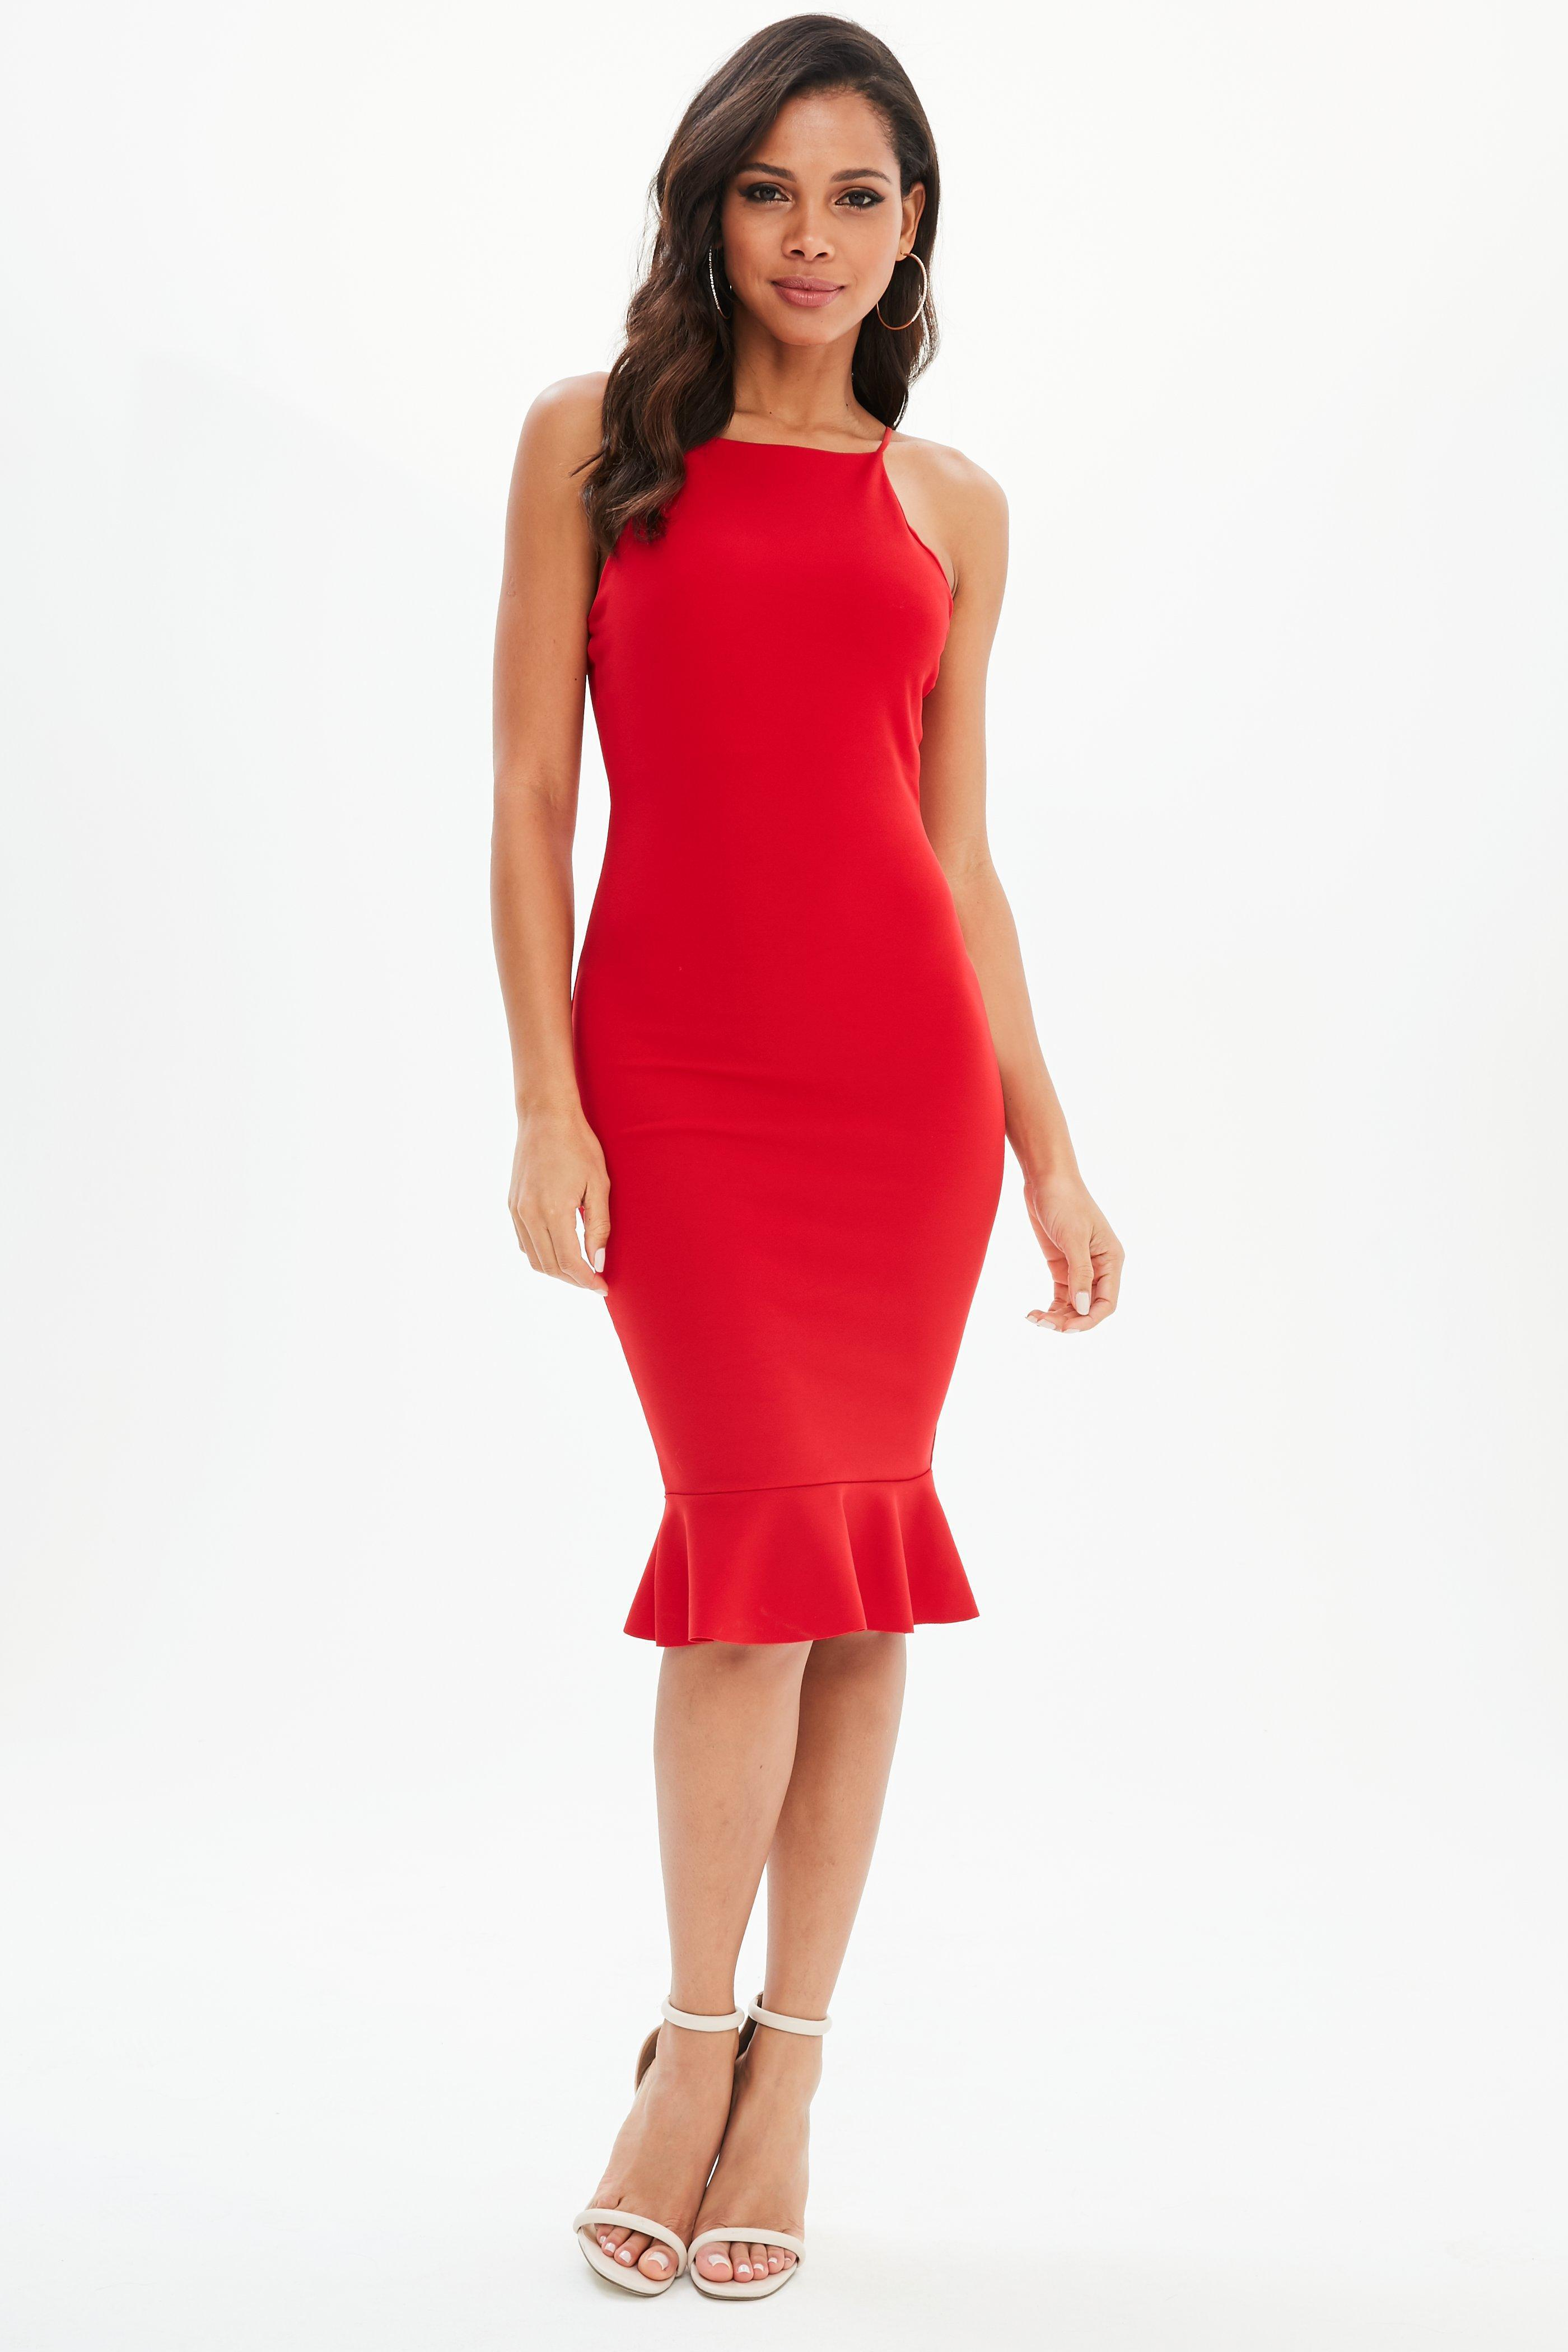 f437305cdd1a2 Lyst - Missguided Red Scuba Square Neck Frill Hem Midi Dress in Red